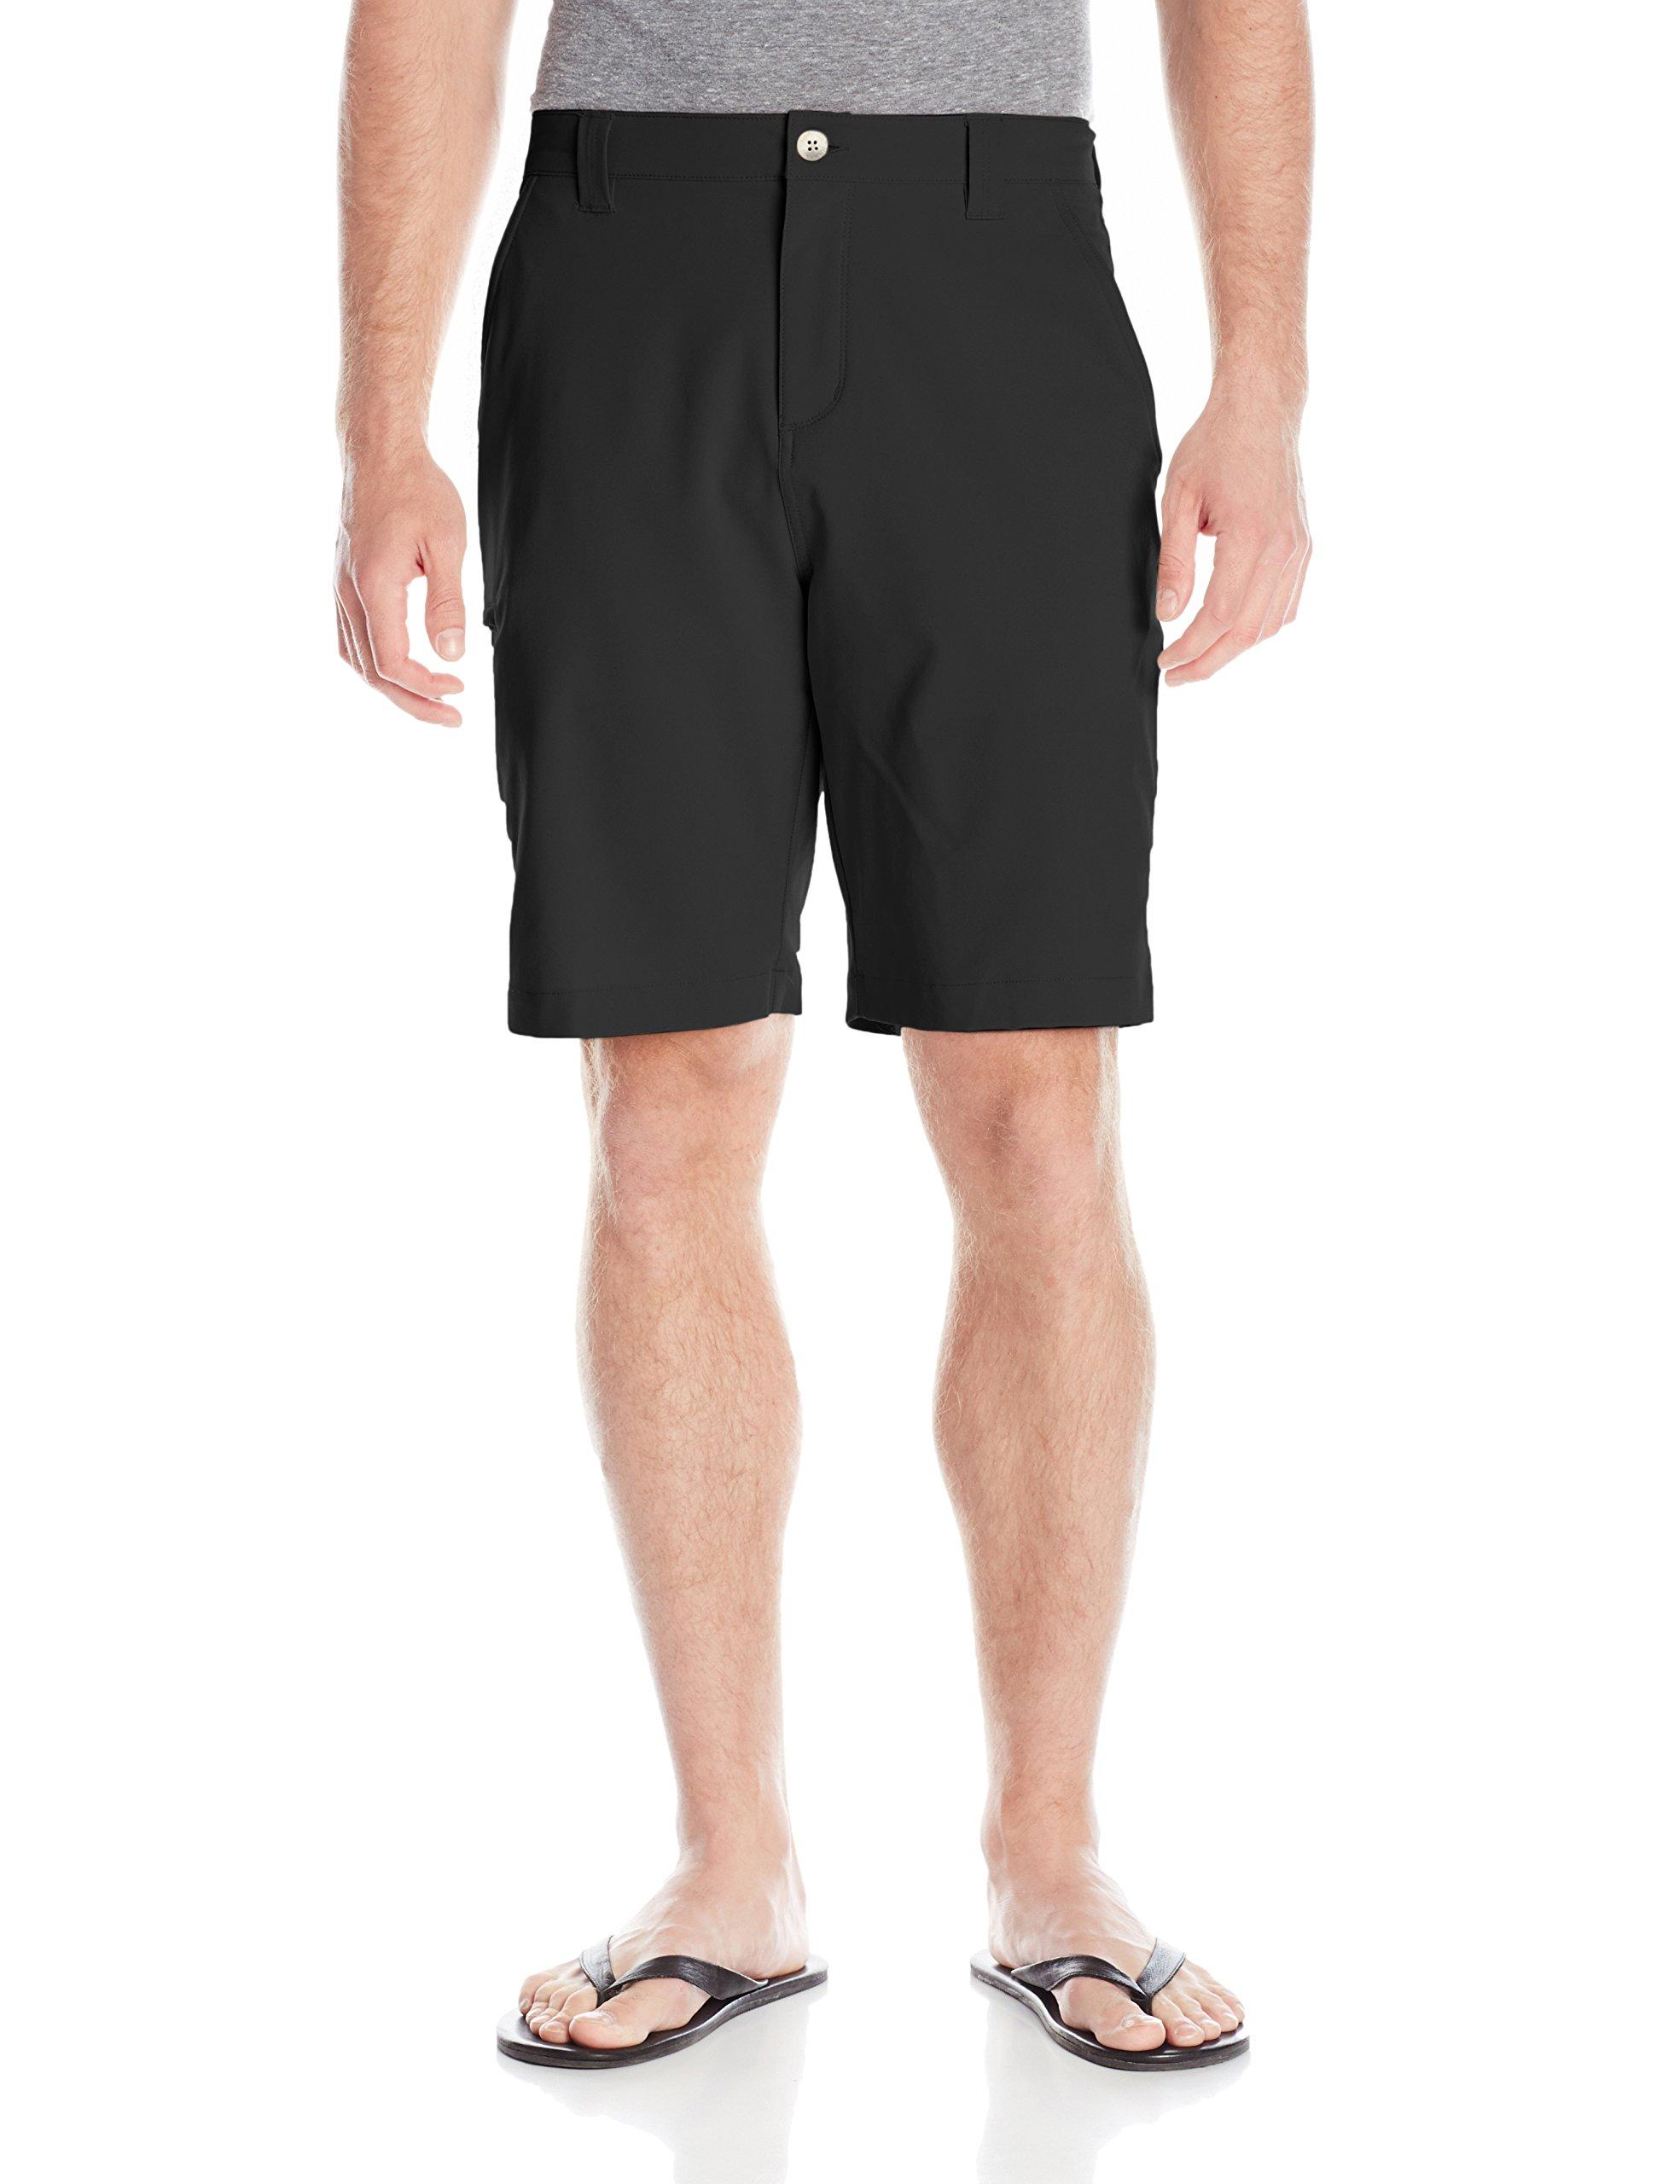 Columbia Sportswear Grander Marlin II Offshore Shorts, Black, 38x10